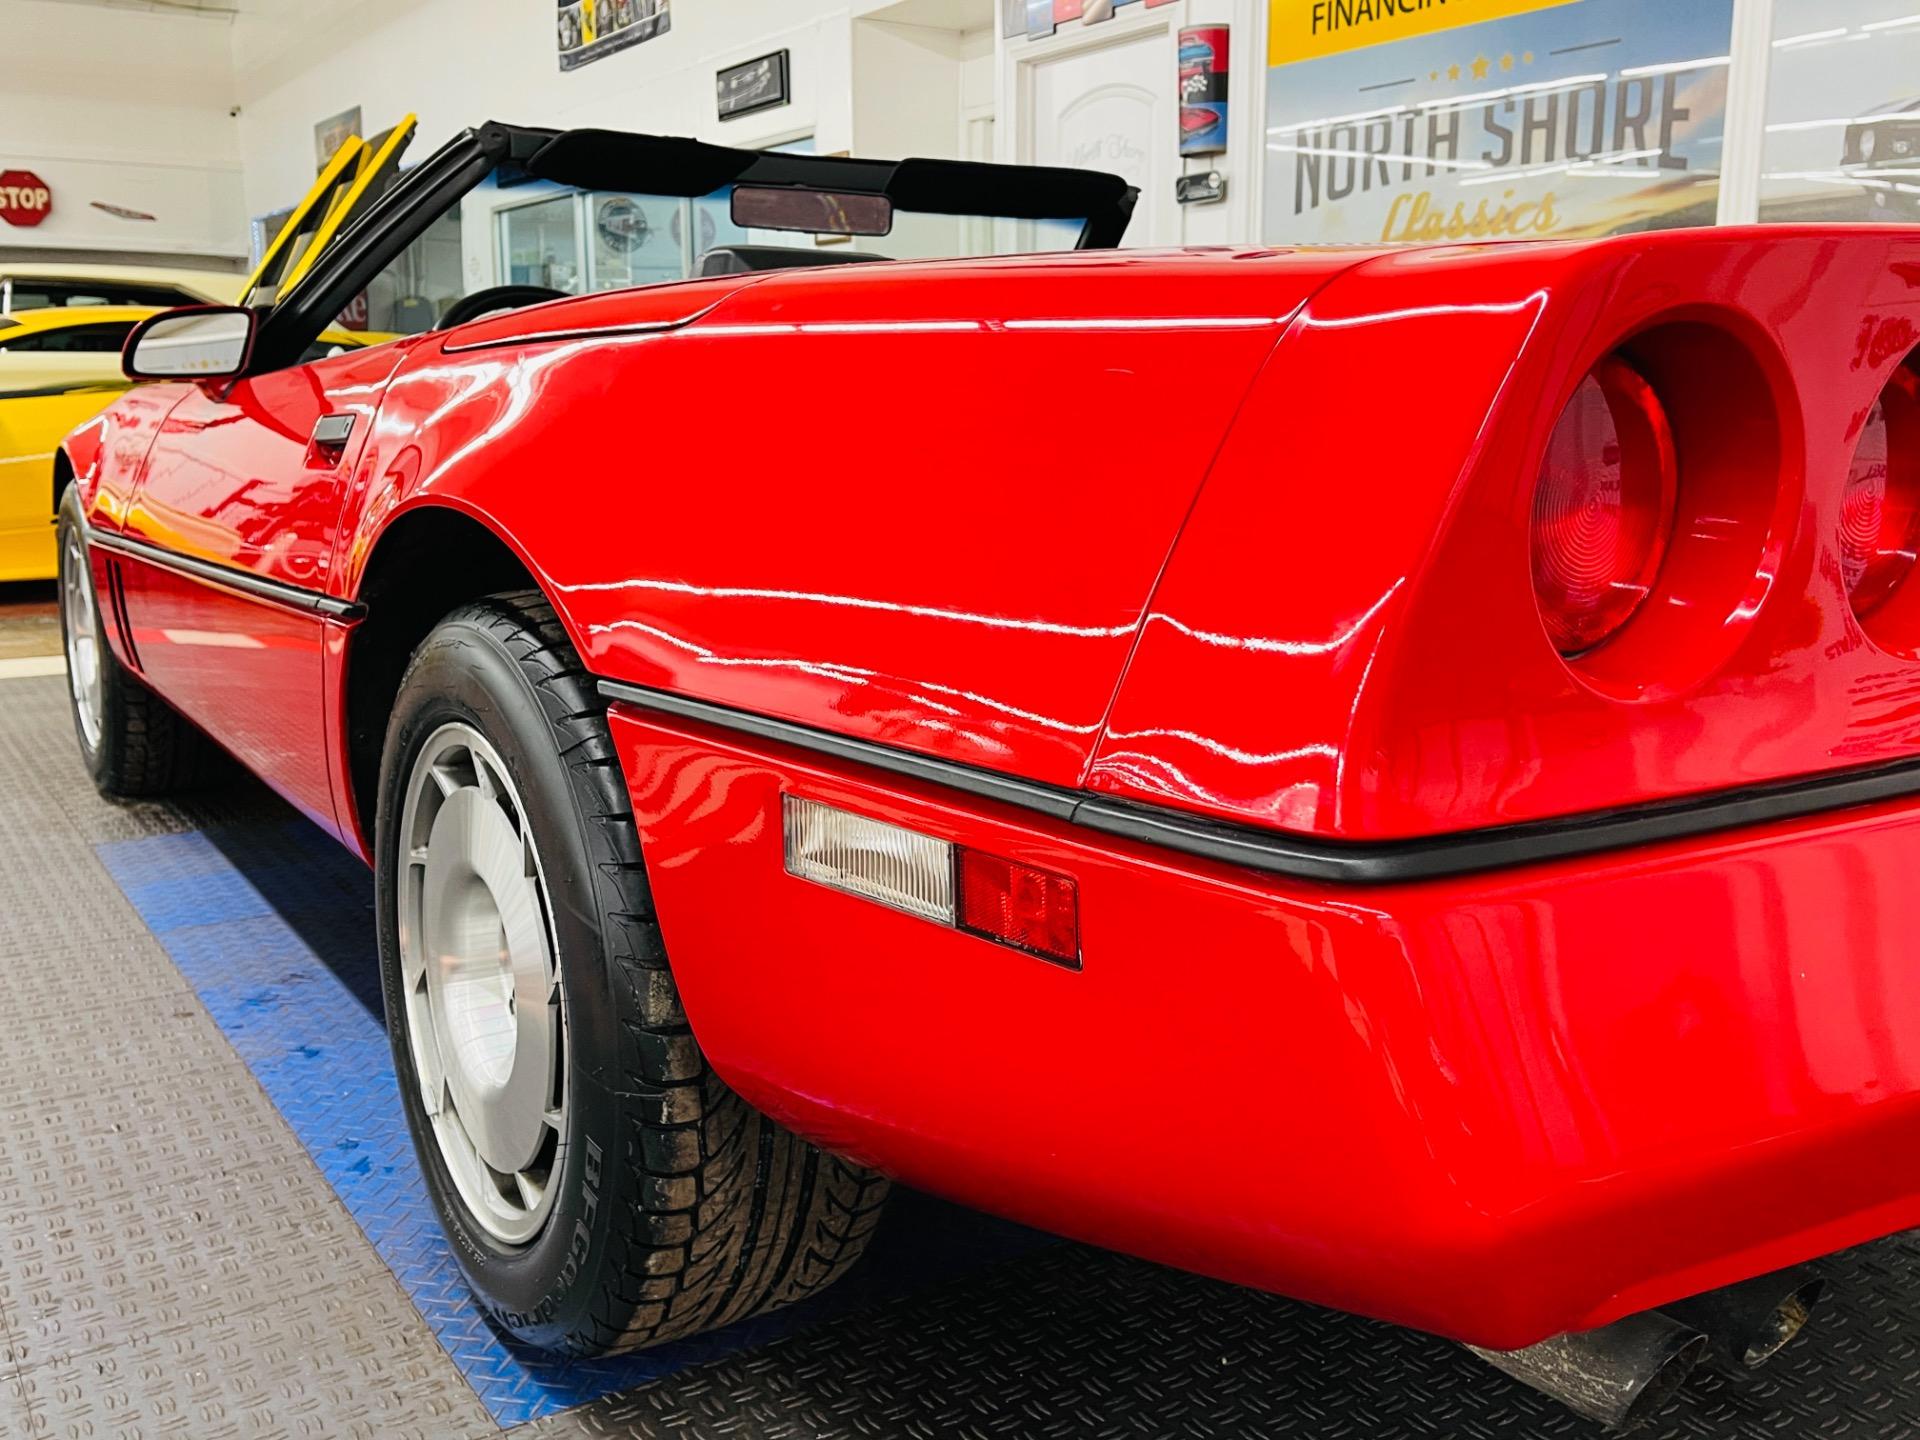 Used 1986 Chevrolet Corvette - CONVERTIBLE - 6,640 ORIGINAL MILES - SEE VIDEO | Mundelein, IL